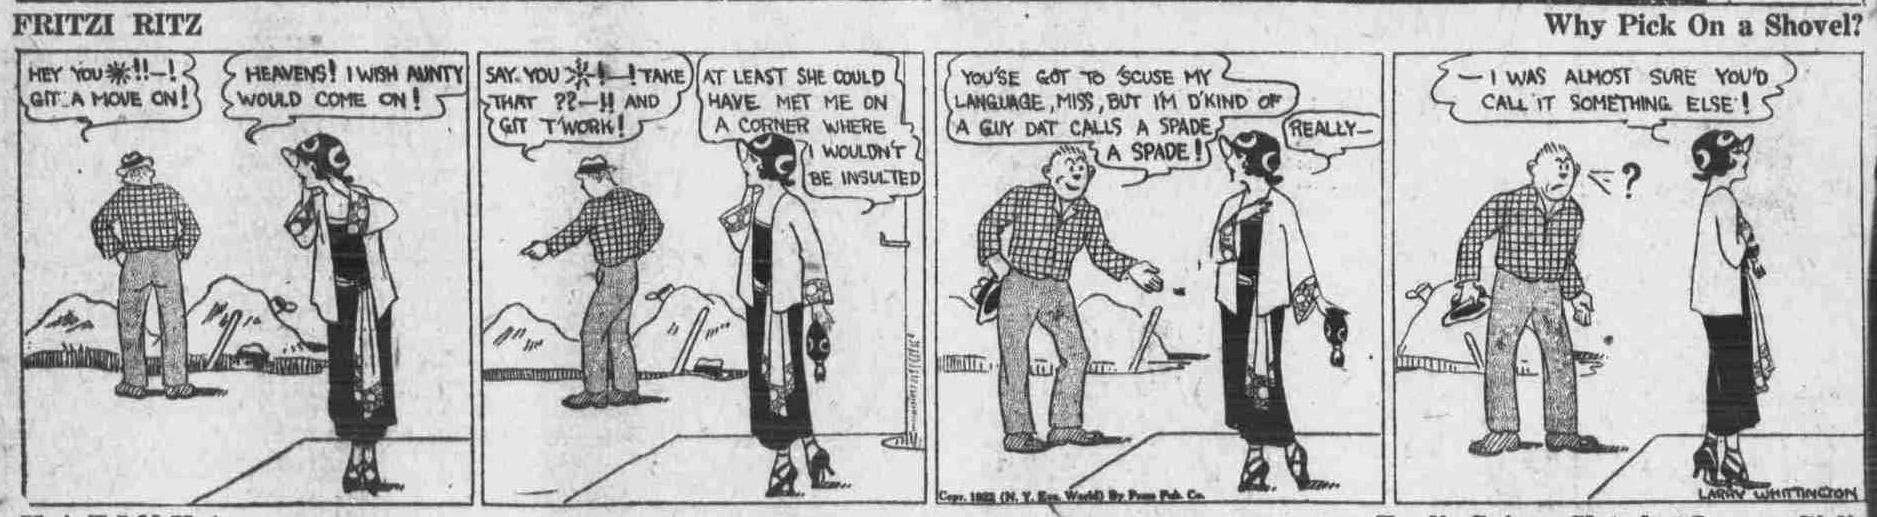 Nov. 3, 1922